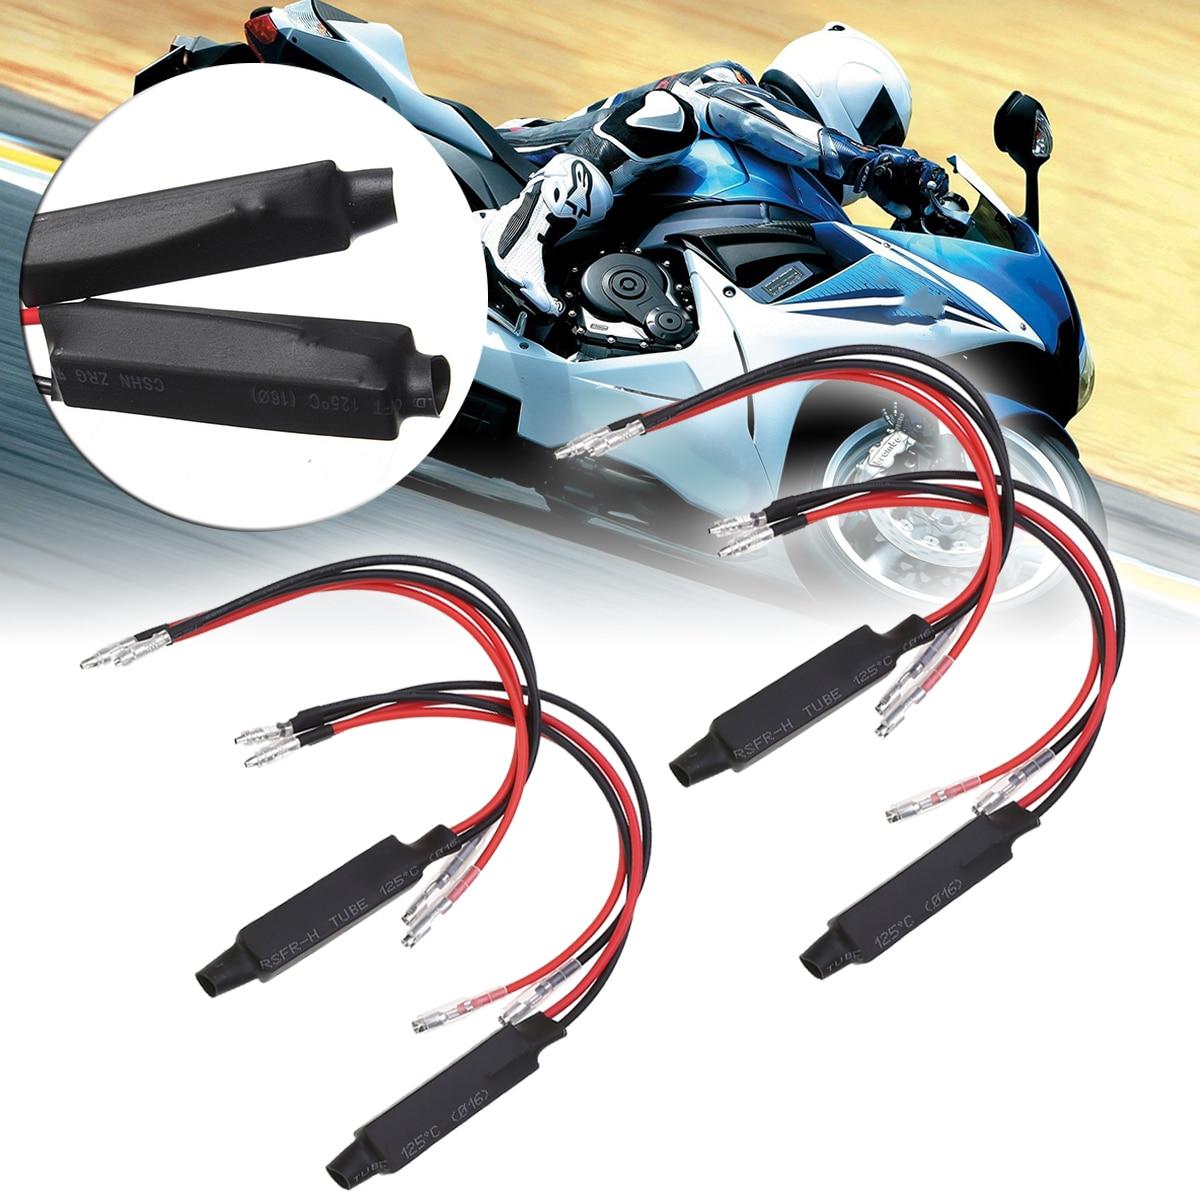 Mayitr 4PCS 12V Black Universal Motorcycle LED Turn Signal Indicator Resistor Adaptor Moto Blinker Adapter LED Load Resistor